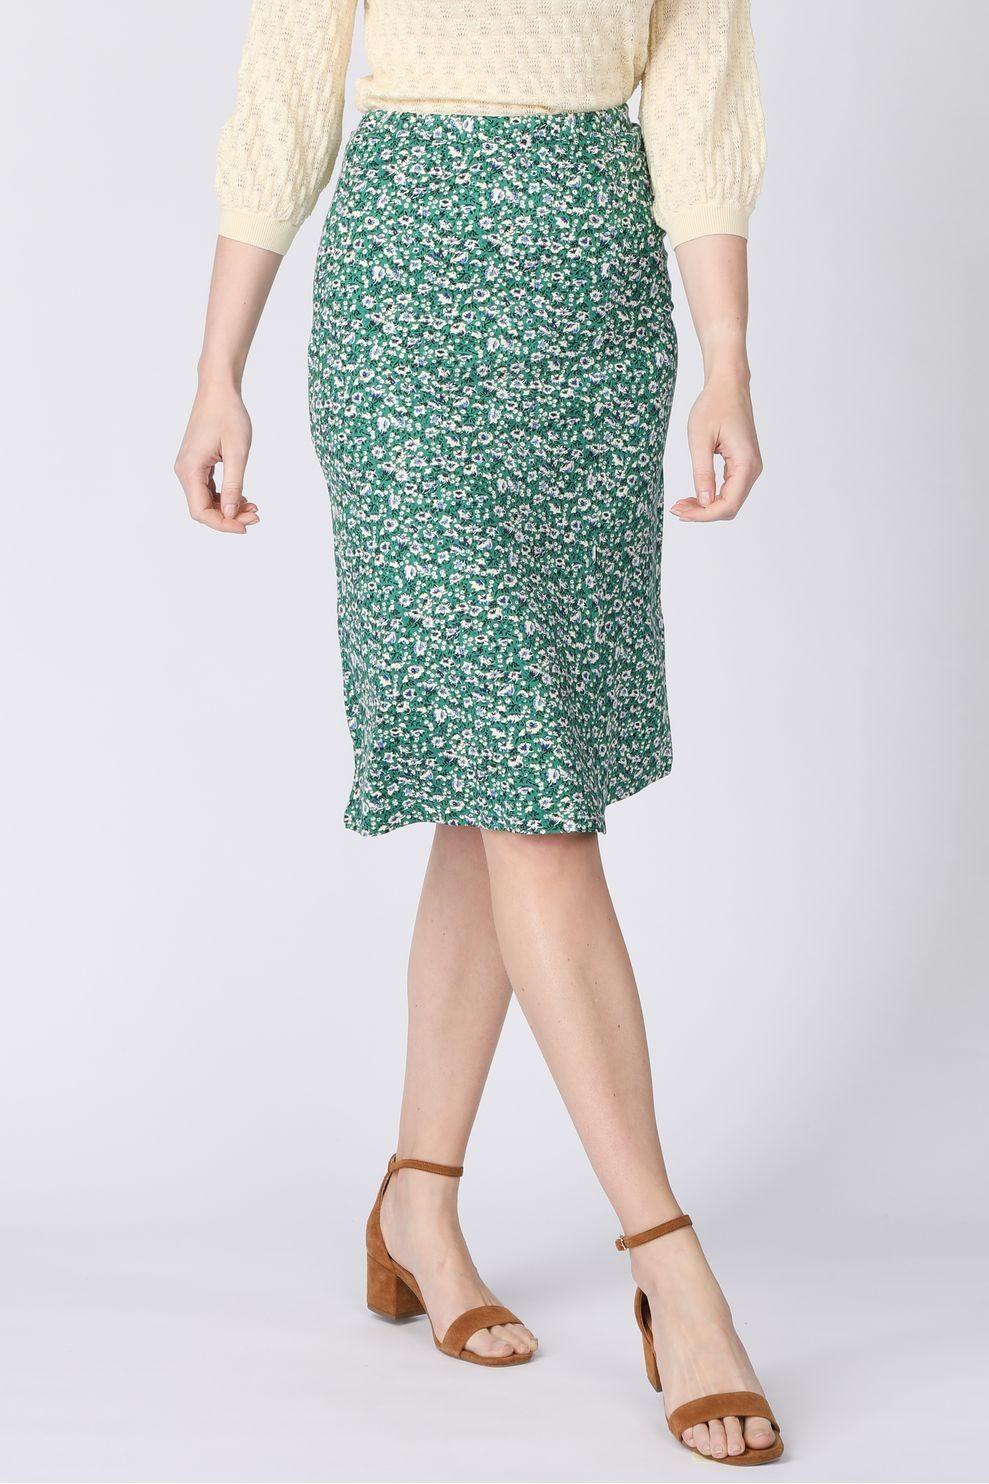 King Louie Rok Iris Skirt Perris voor dames - Groen/Wit - Maten: S, M, L, XL